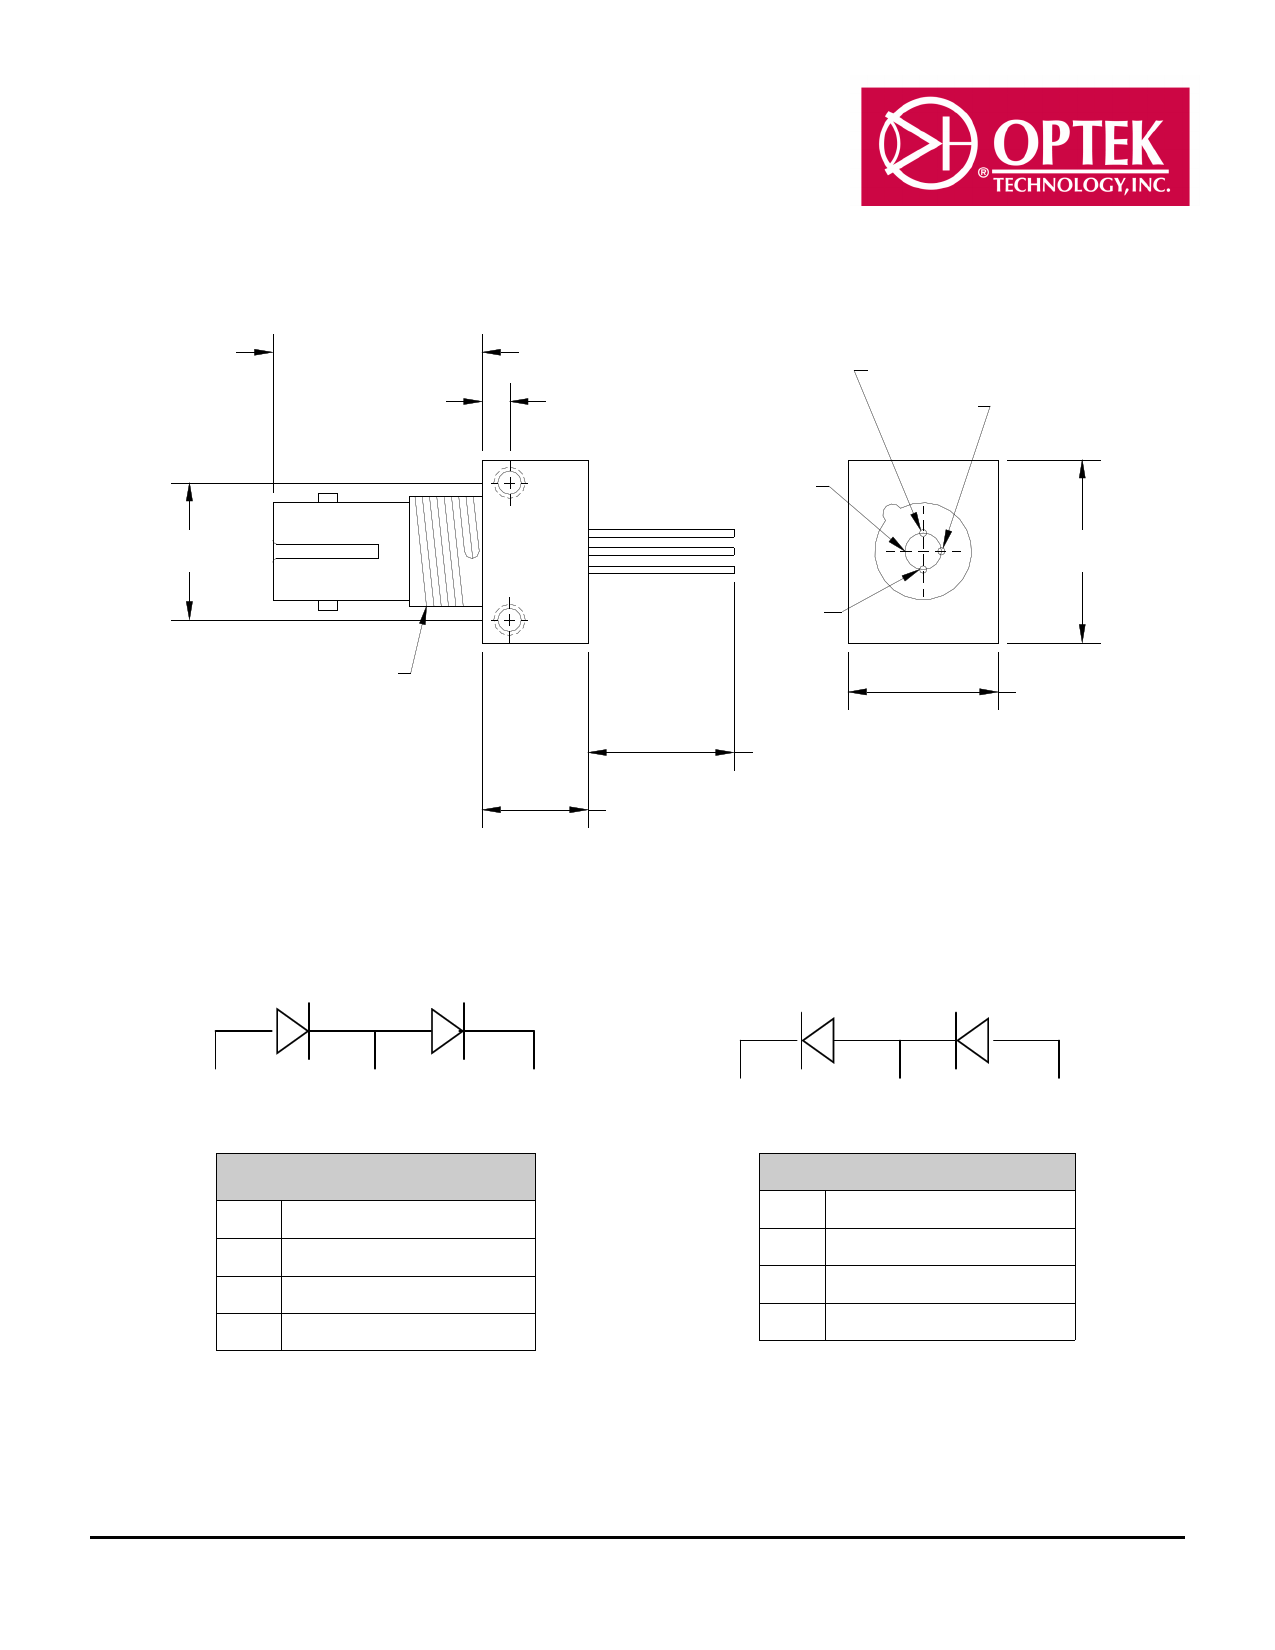 OPV214YAT pdf, 반도체, 판매, 대치품